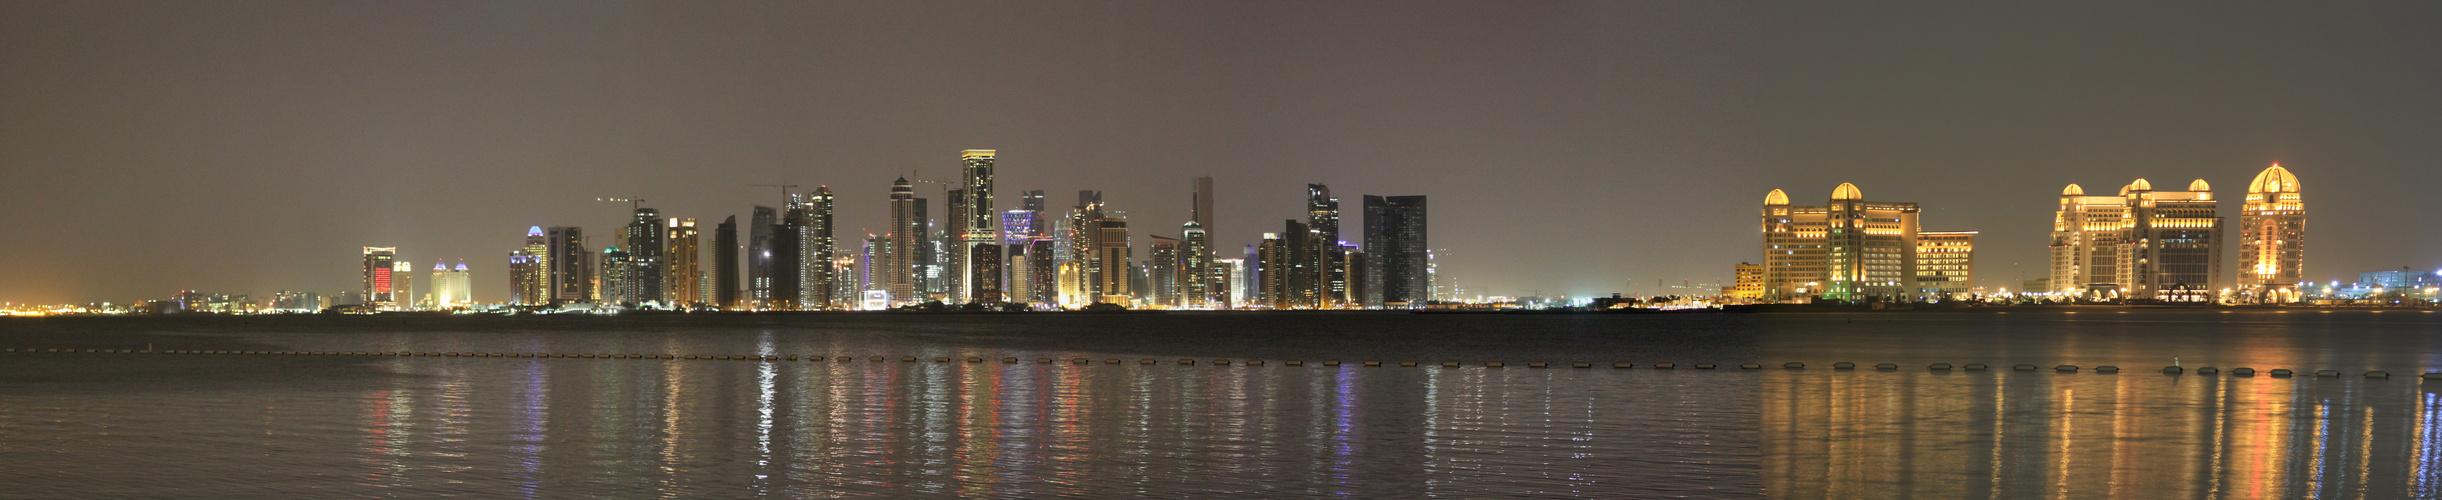 Skyline from Doha, Qatar